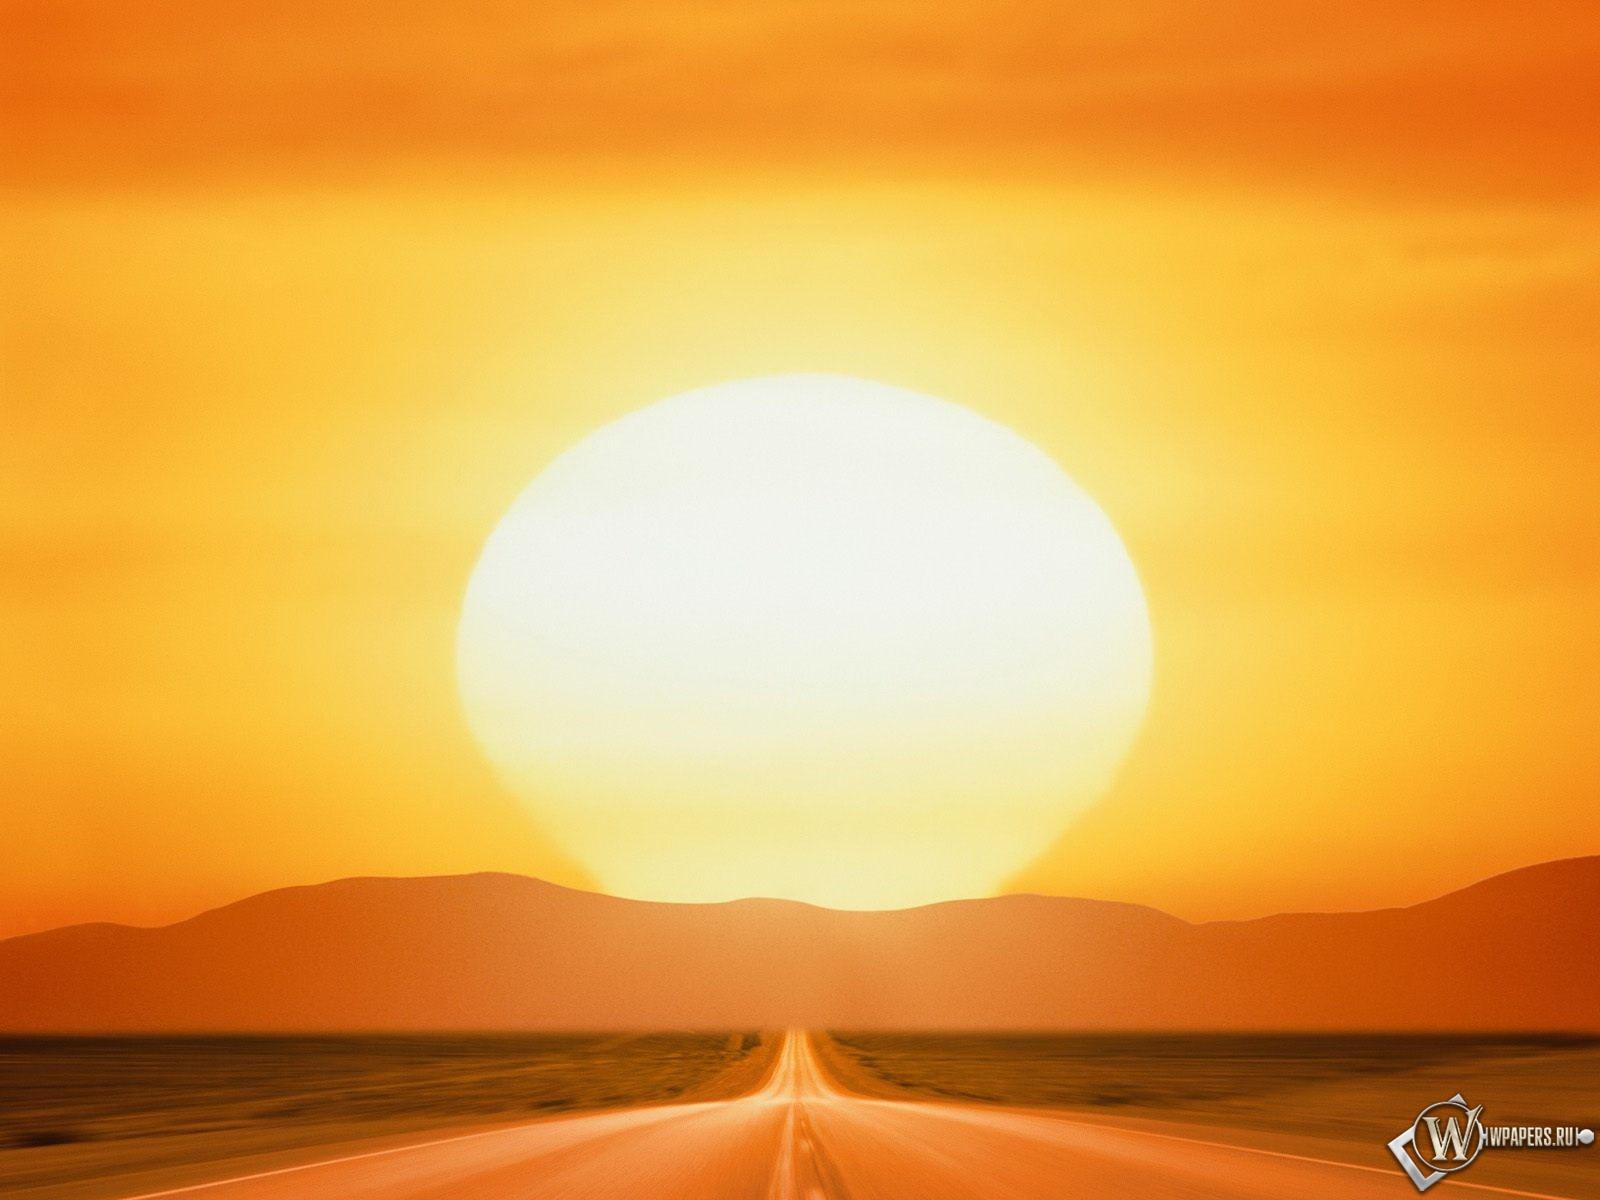 Дорога к солнцу 1600x1200